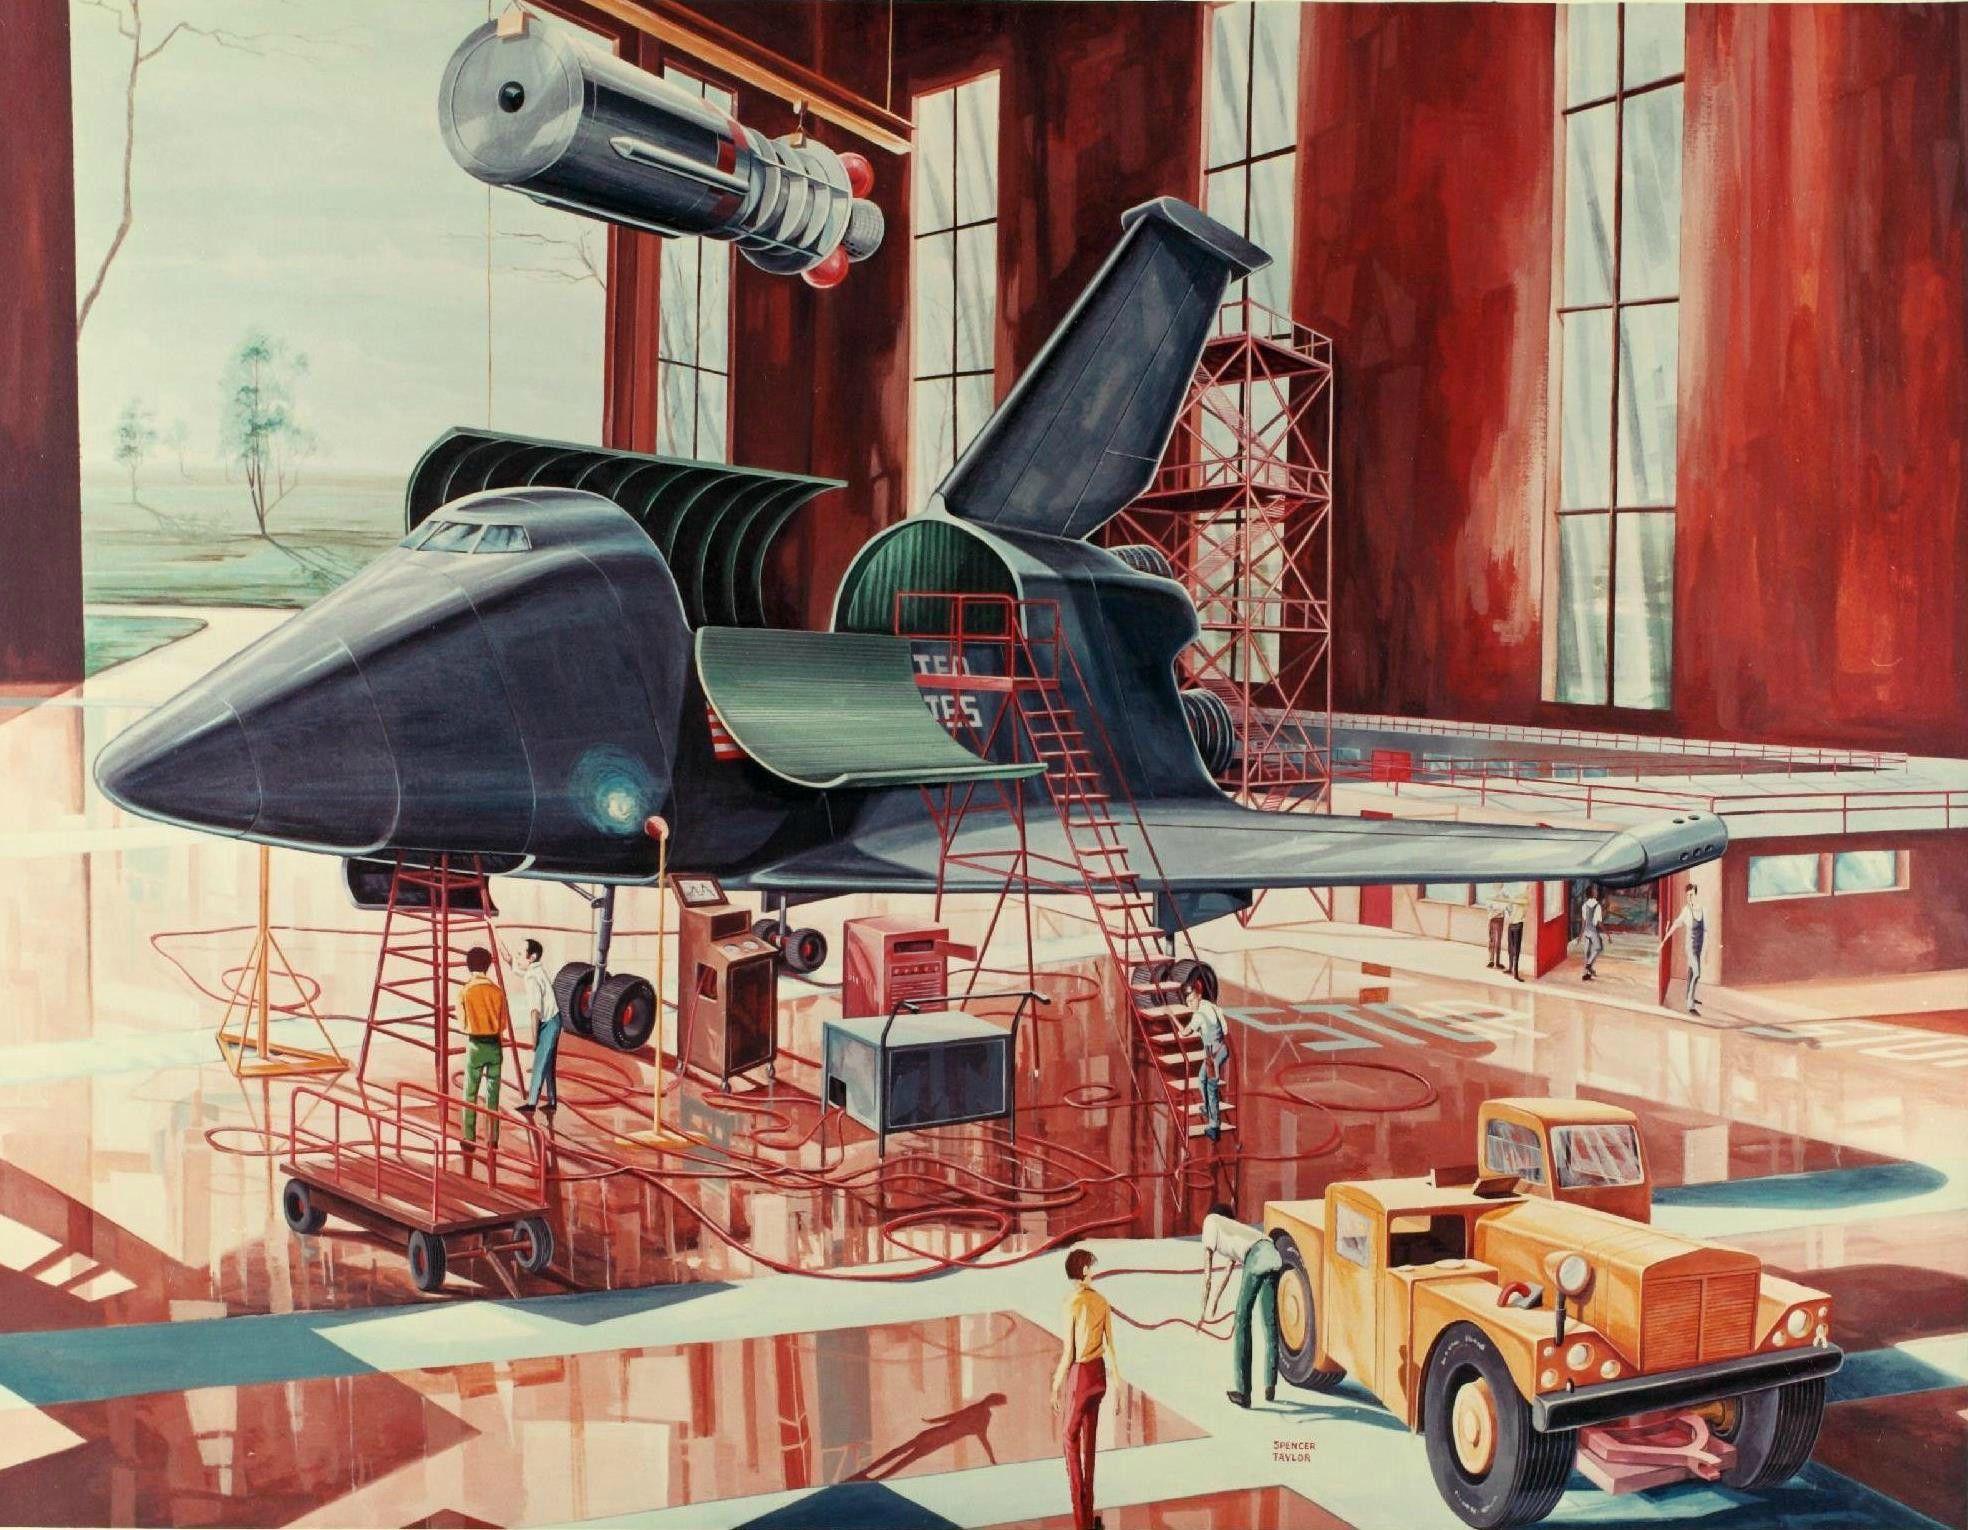 Na nasa new space shuttle design - Nasa Space Shuttle Concept Art